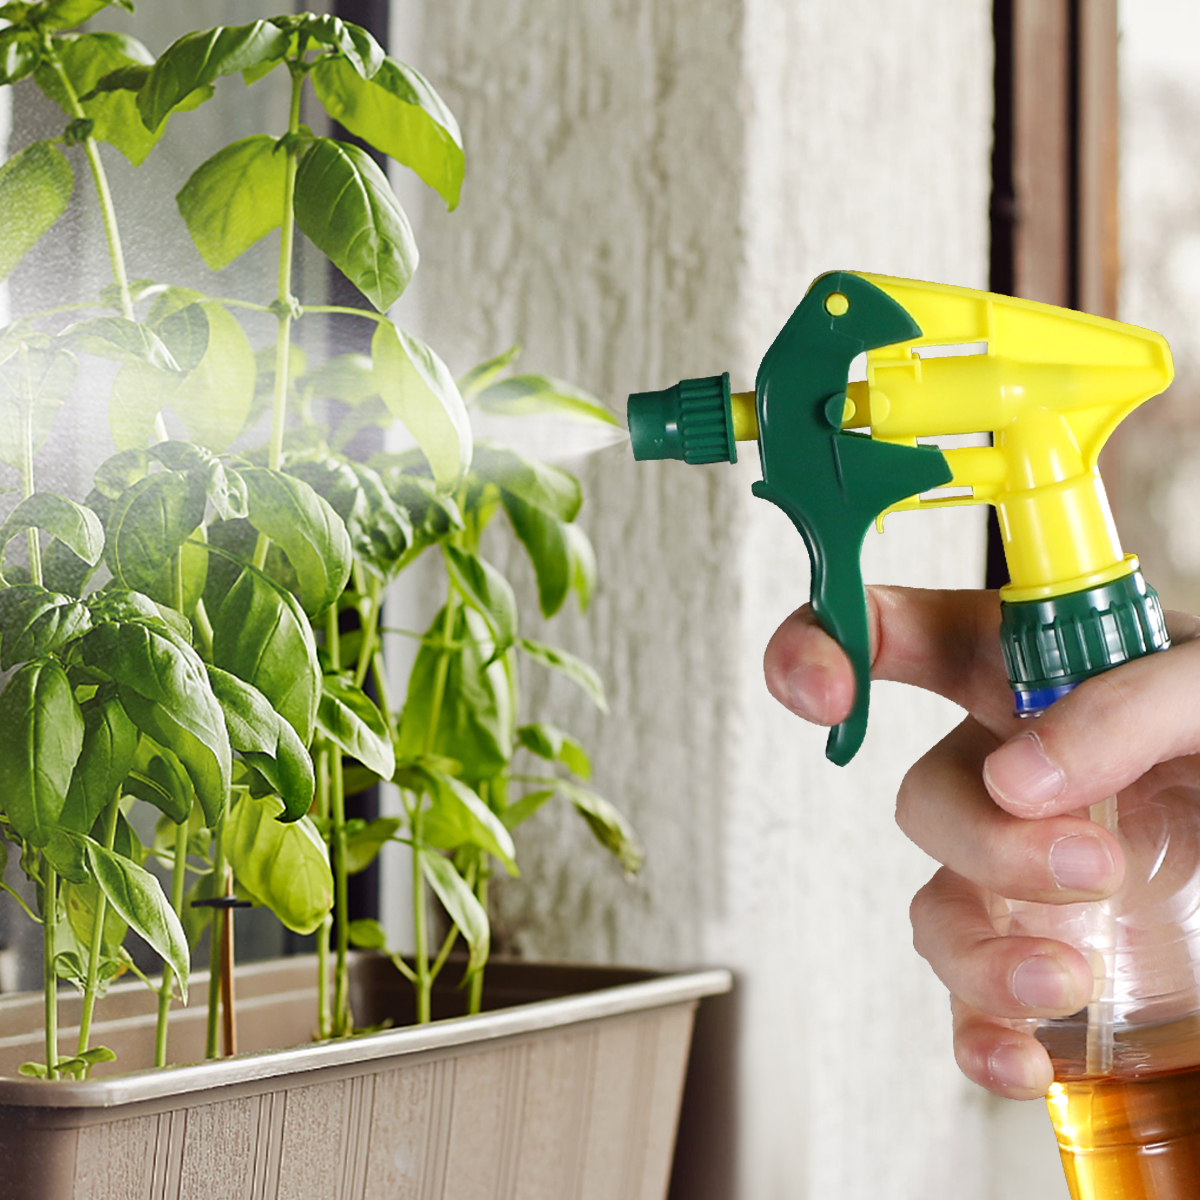 10pcs Universal Spray Bottle Trigger Replacement Plastic Spray Nozzles Thicken Sprayer Replacement Trigger Spray Tops Spray Head-5